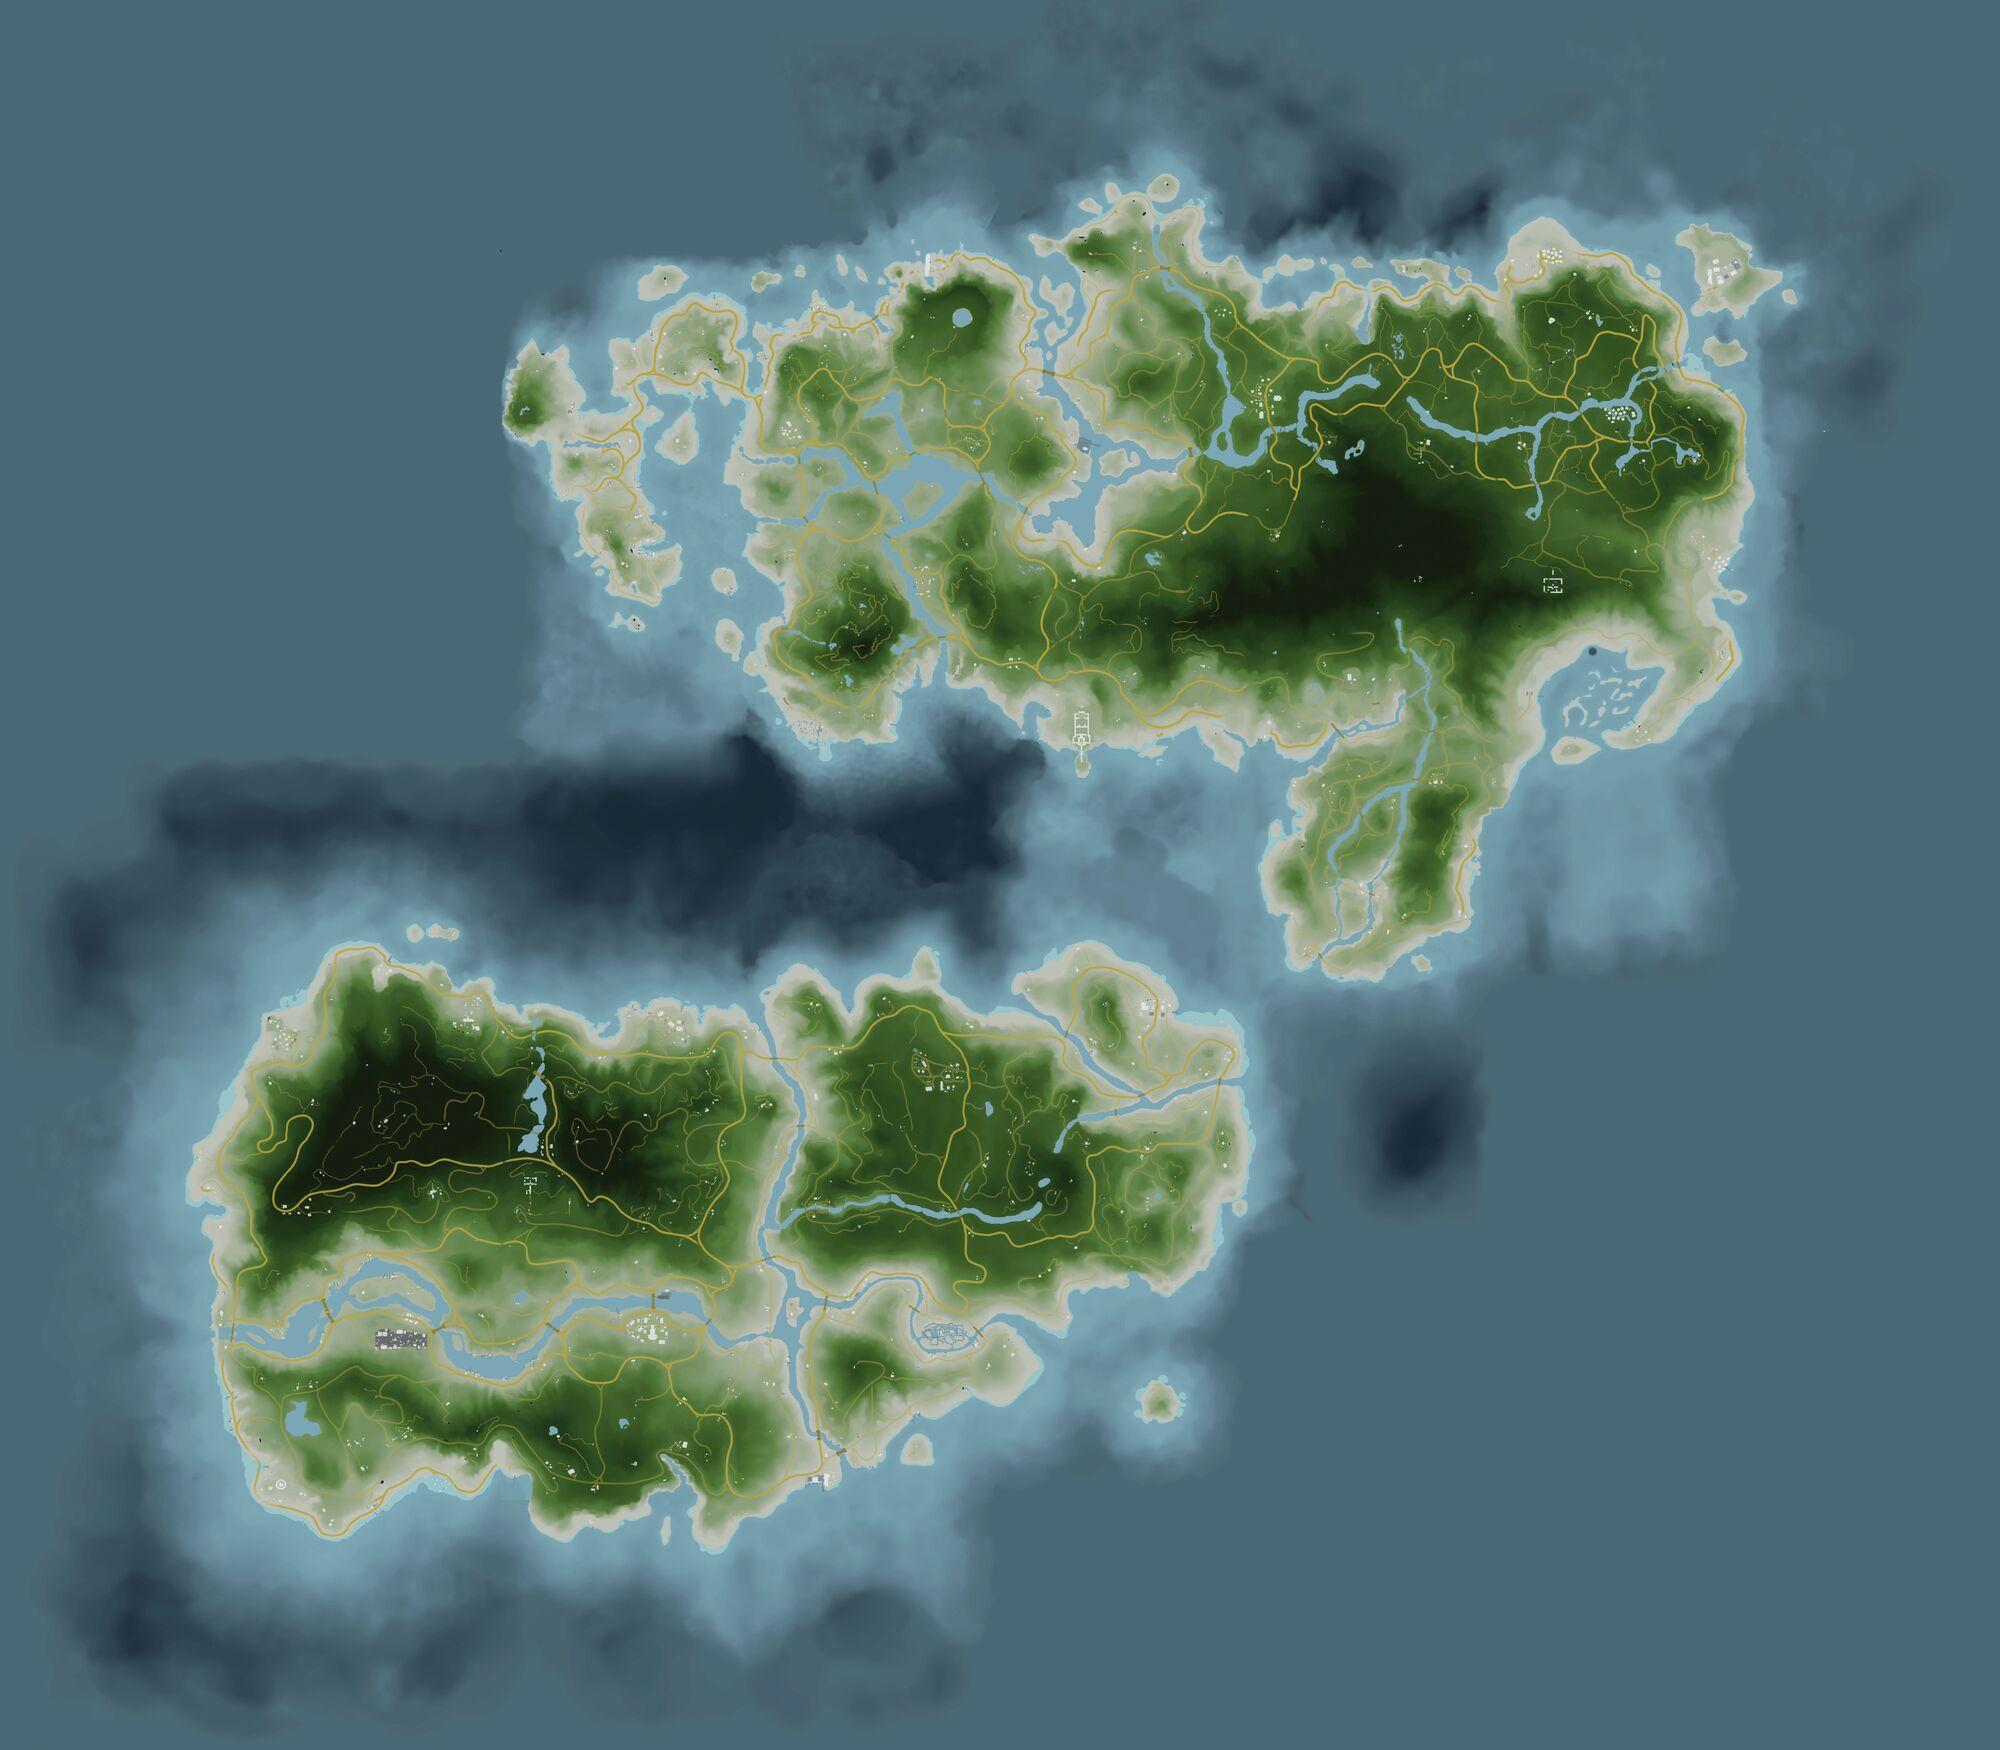 Rook islands far cry wiki fandom powered by wikia gumiabroncs Gallery